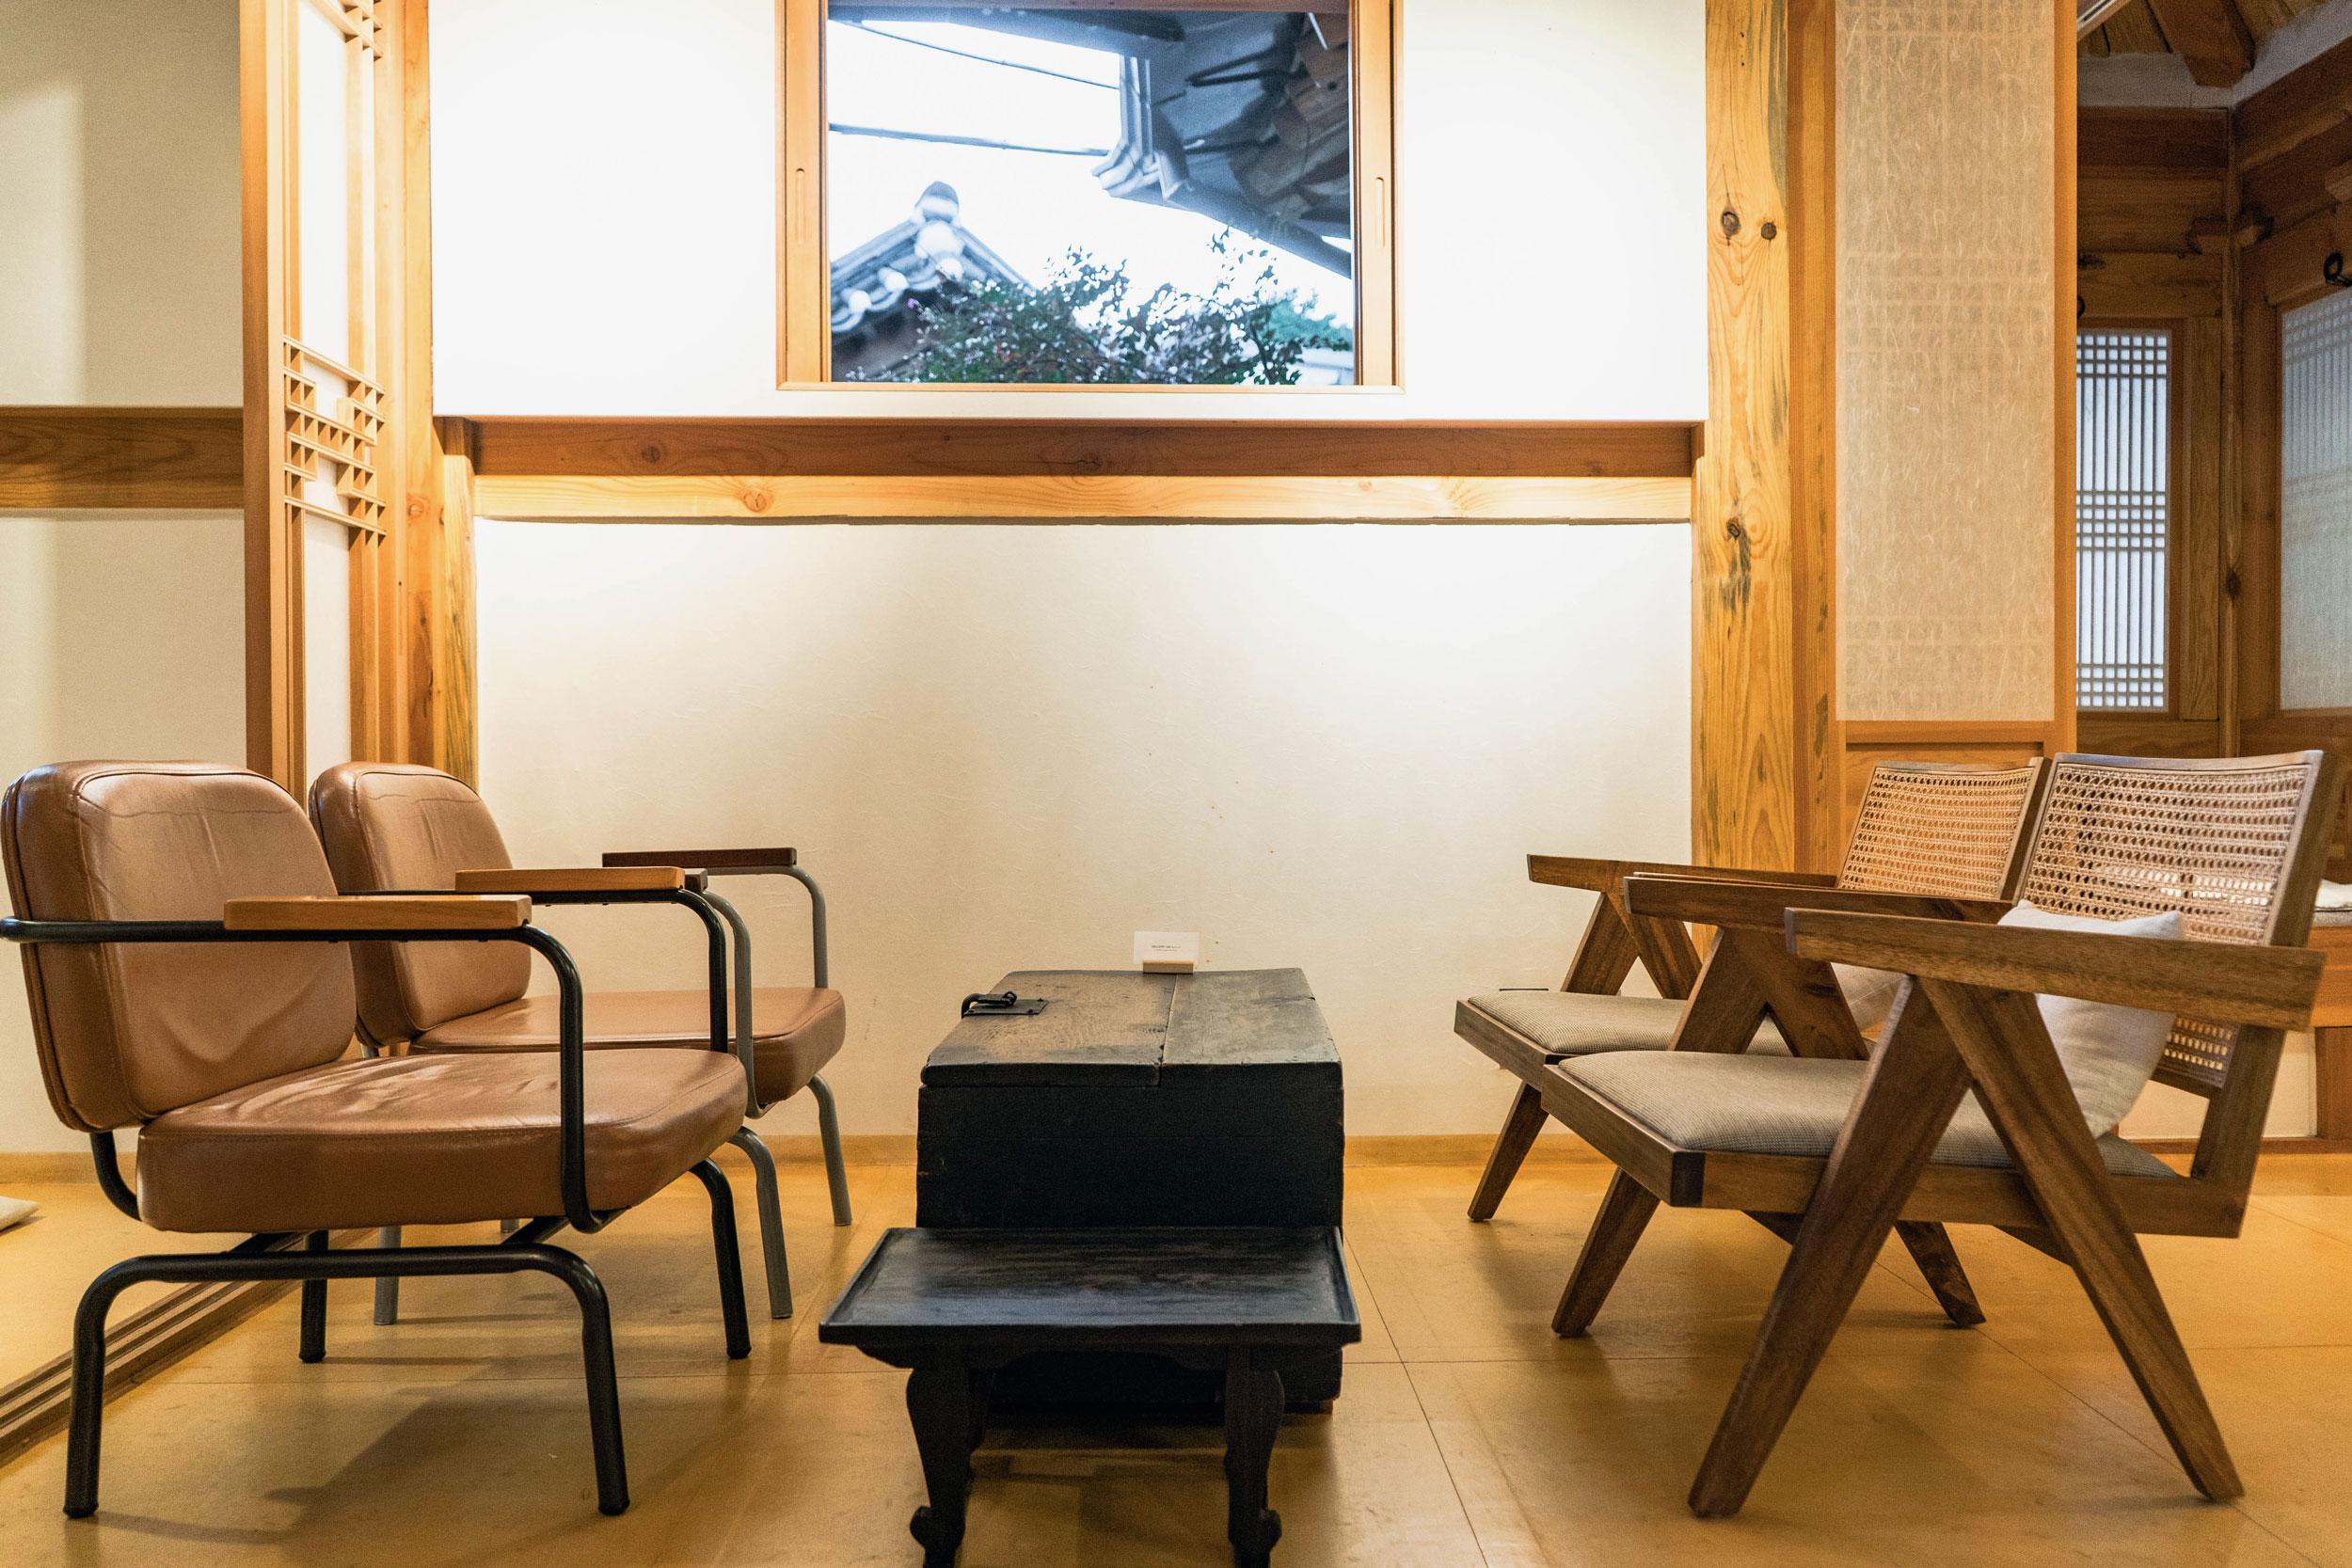 seoul-korea-bukchon-gallery-sai-10.jpg